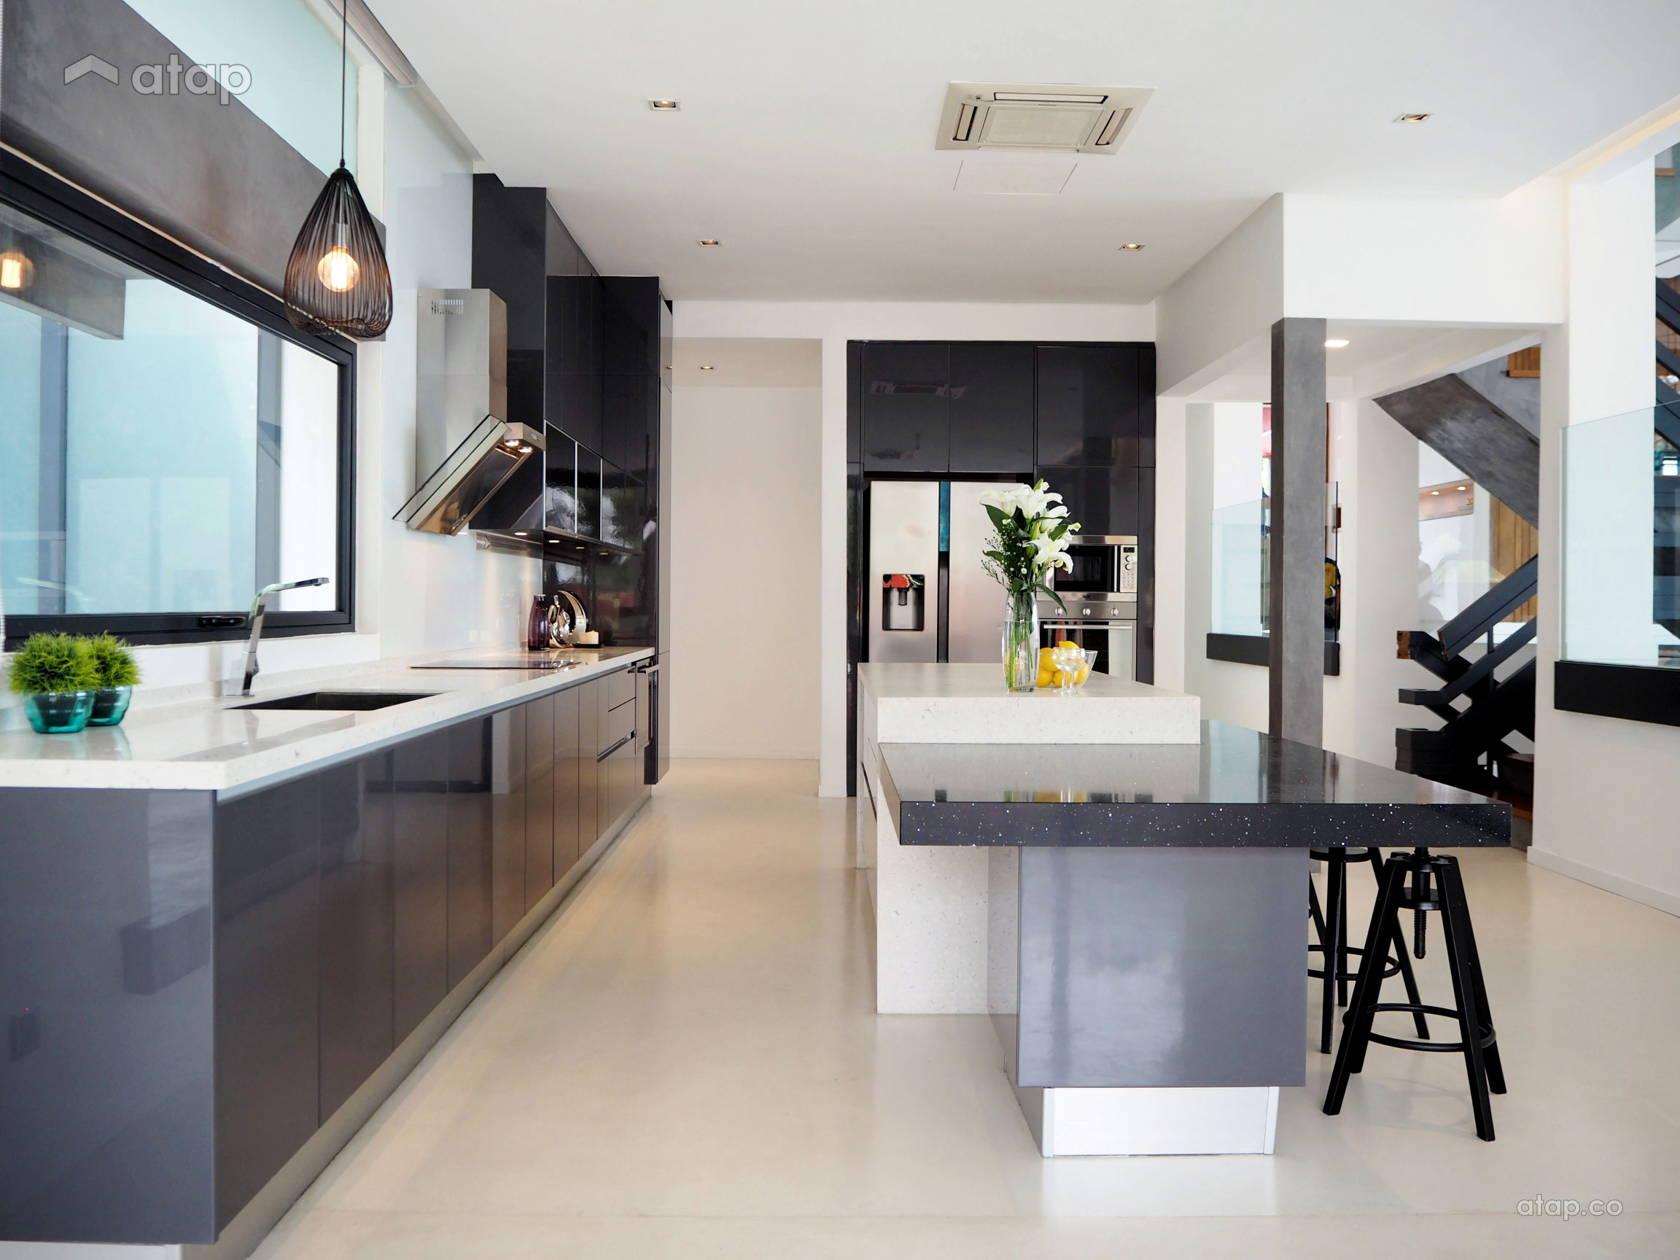 kitchen cabinets interior design ideas malaysia   Minimalistic Modern Kitchen bungalow design ideas & photos ...